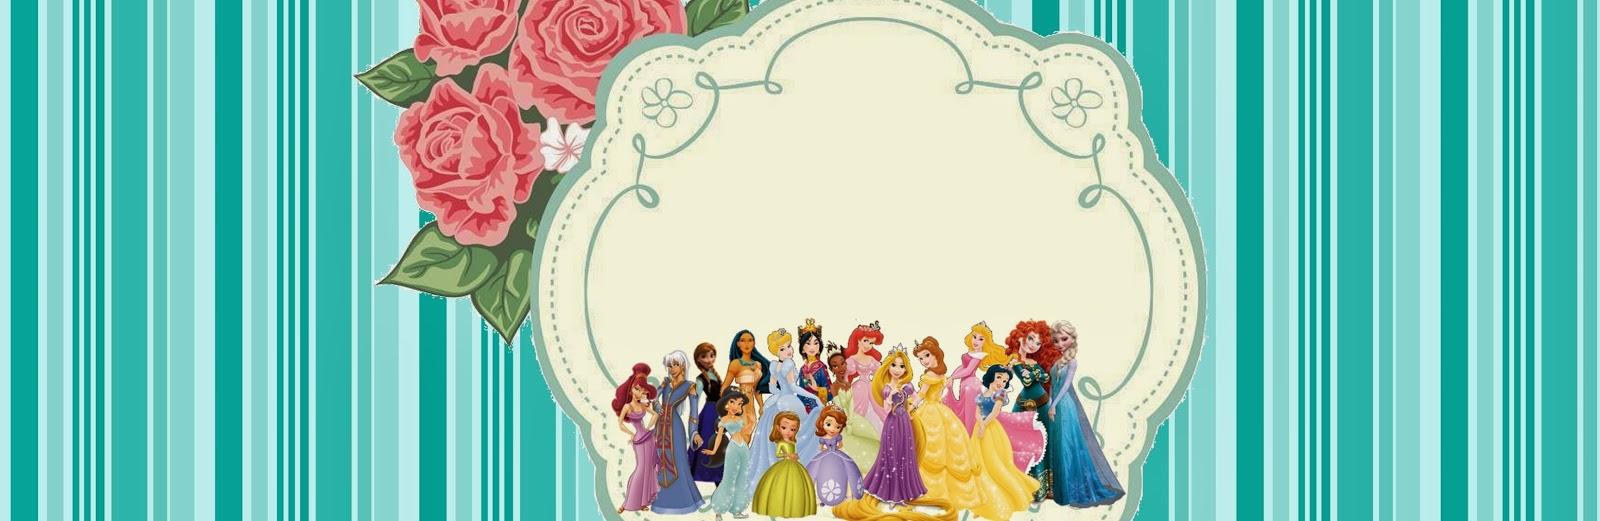 Imprimibles gratis de Princesas Disney.